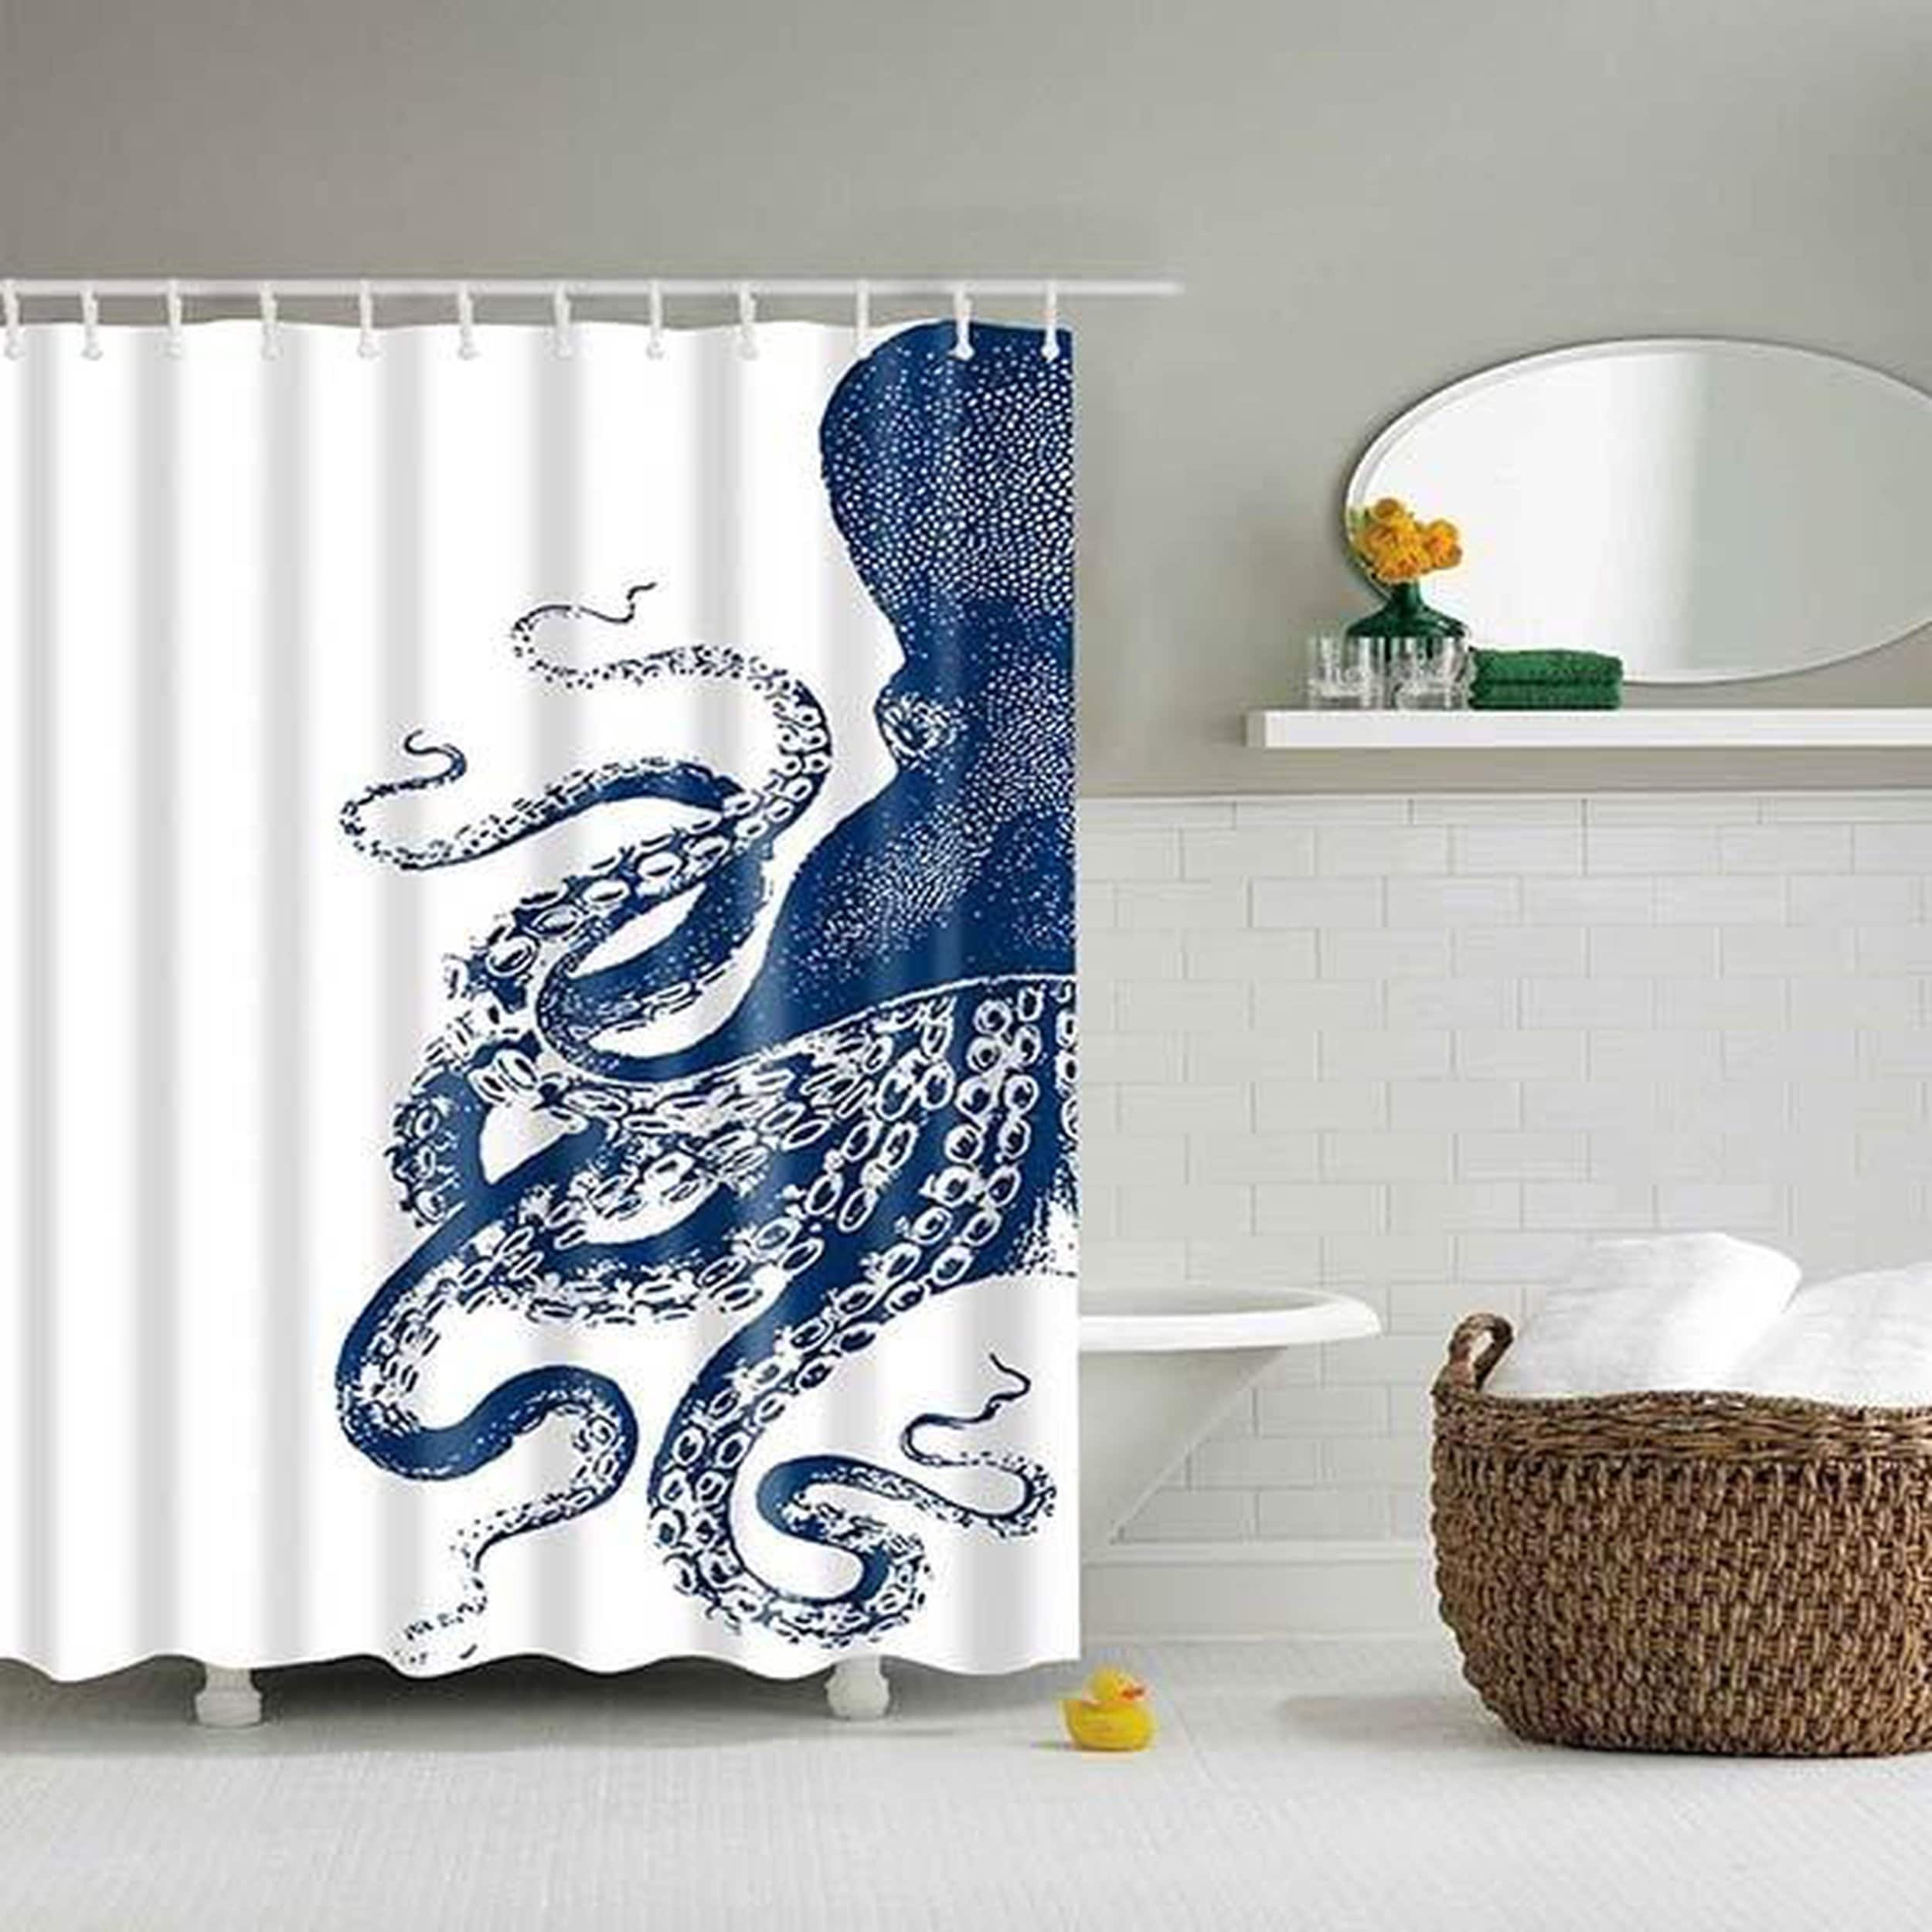 Shop Black Friday Deals On Bathroom Shower Curtains 3d Decor Nautical Shower Curtain Overstock 25414614